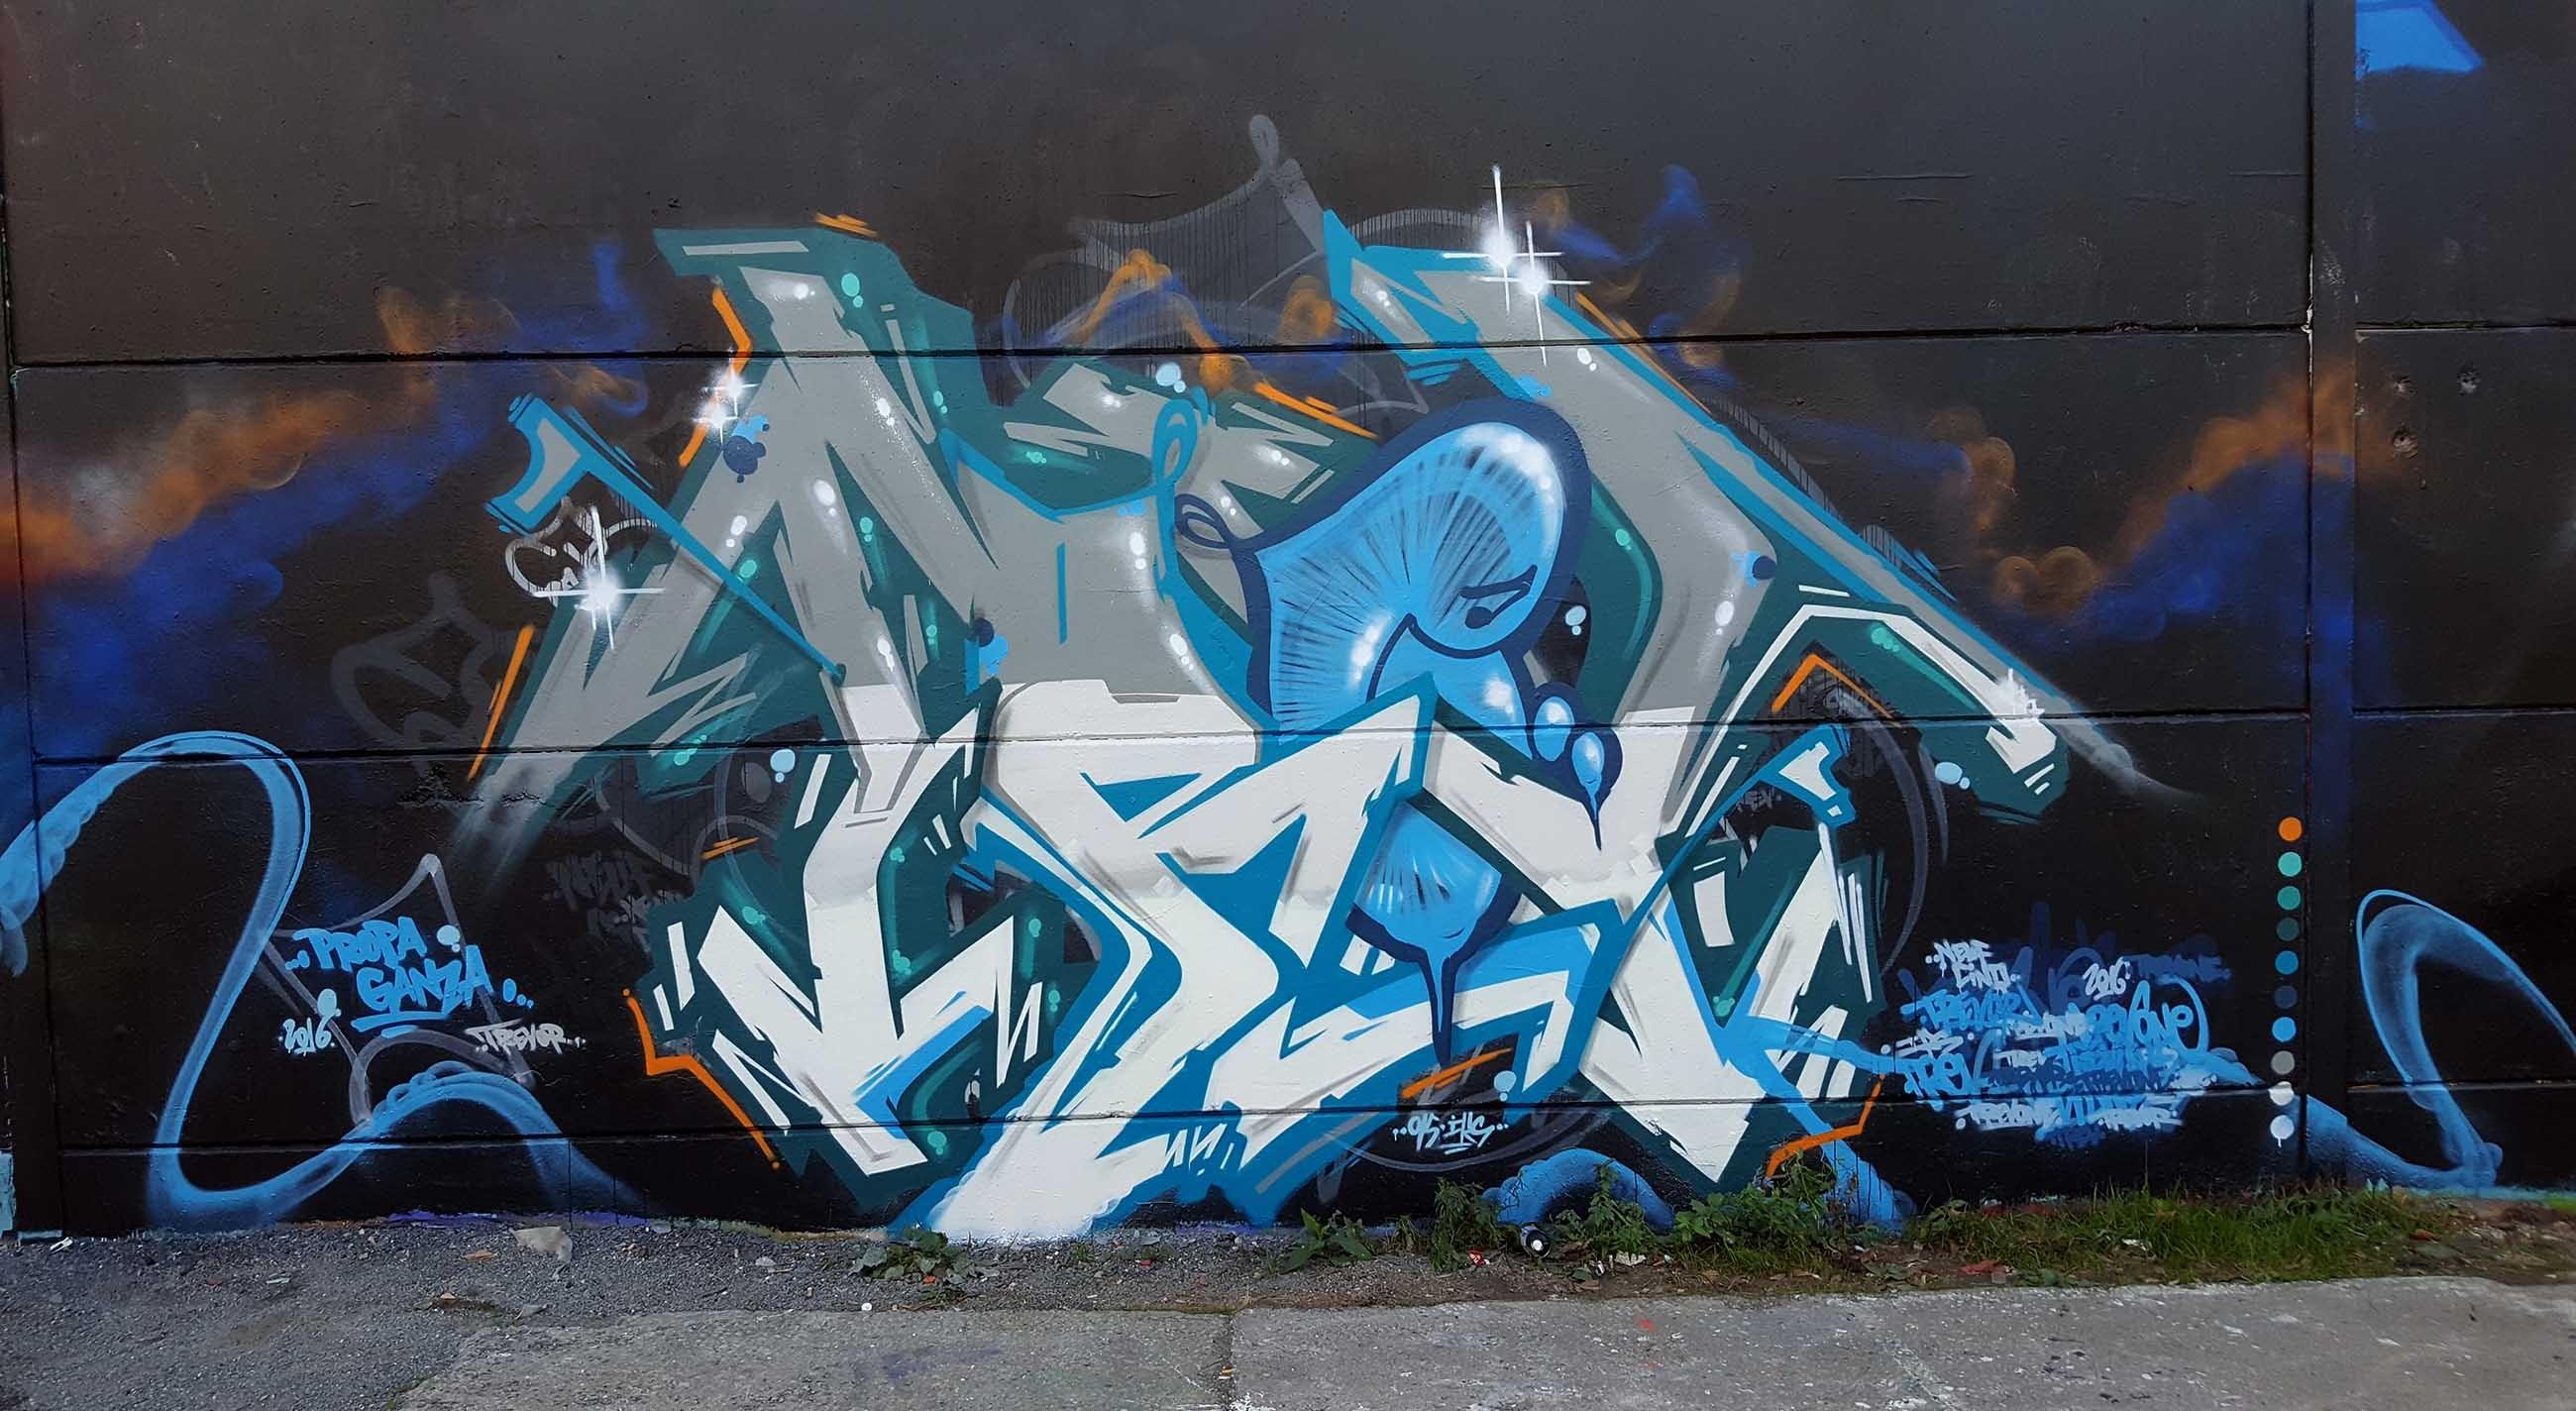 https://www.propaganza.be/wp-content/uploads/2015/09/Trevor-lettrage-typo-font-calligraphie-propaganza-urban-artist-graffiti-graff-street-art-spray-painting-belgique-4-1.jpg